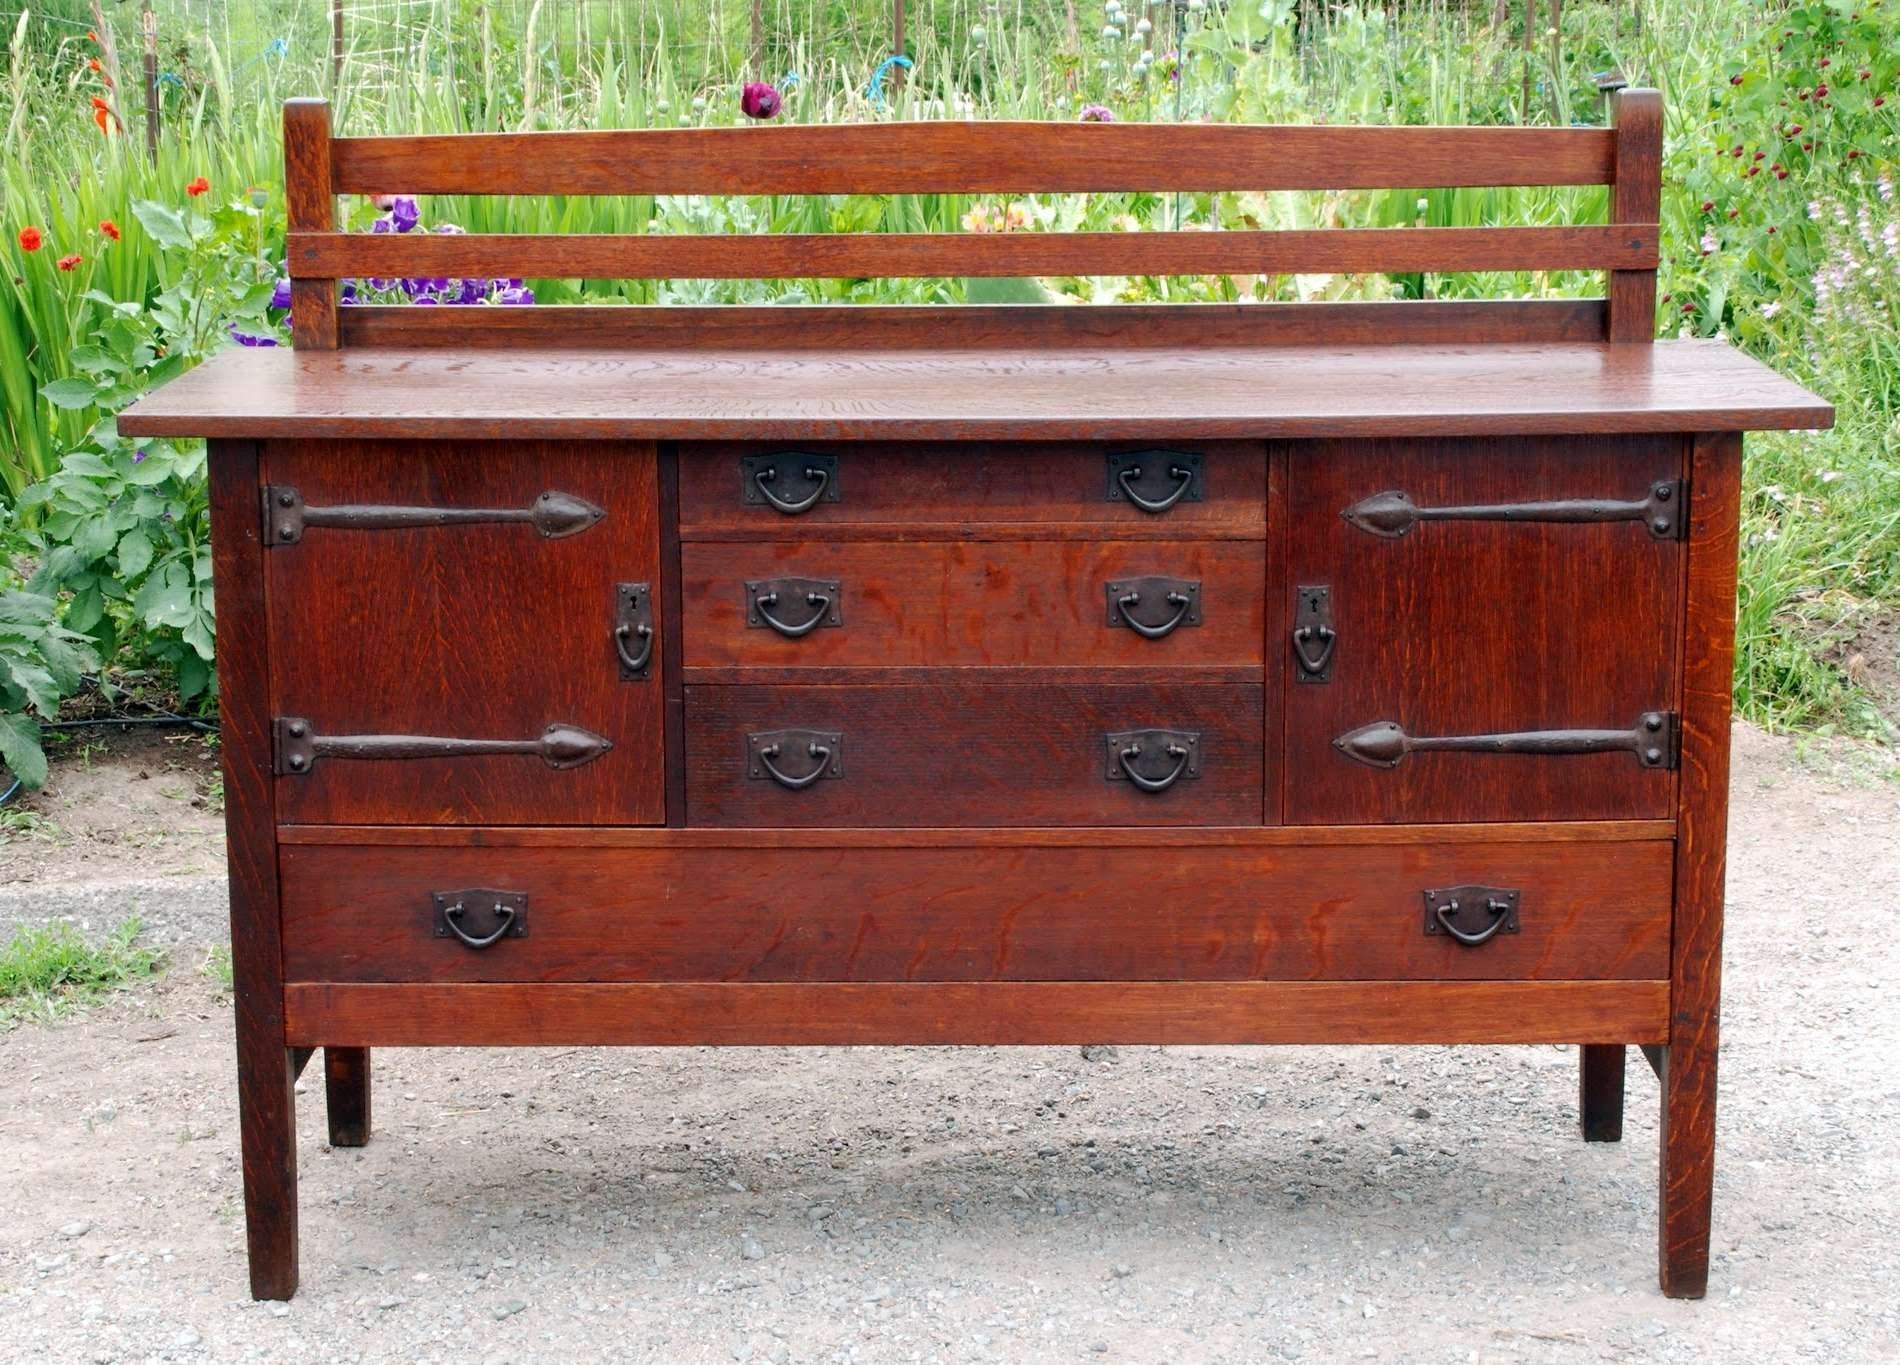 Voorhees Craftsman Mission Oak Furniture – Original Gustav With Stickley Sideboards (View 19 of 20)